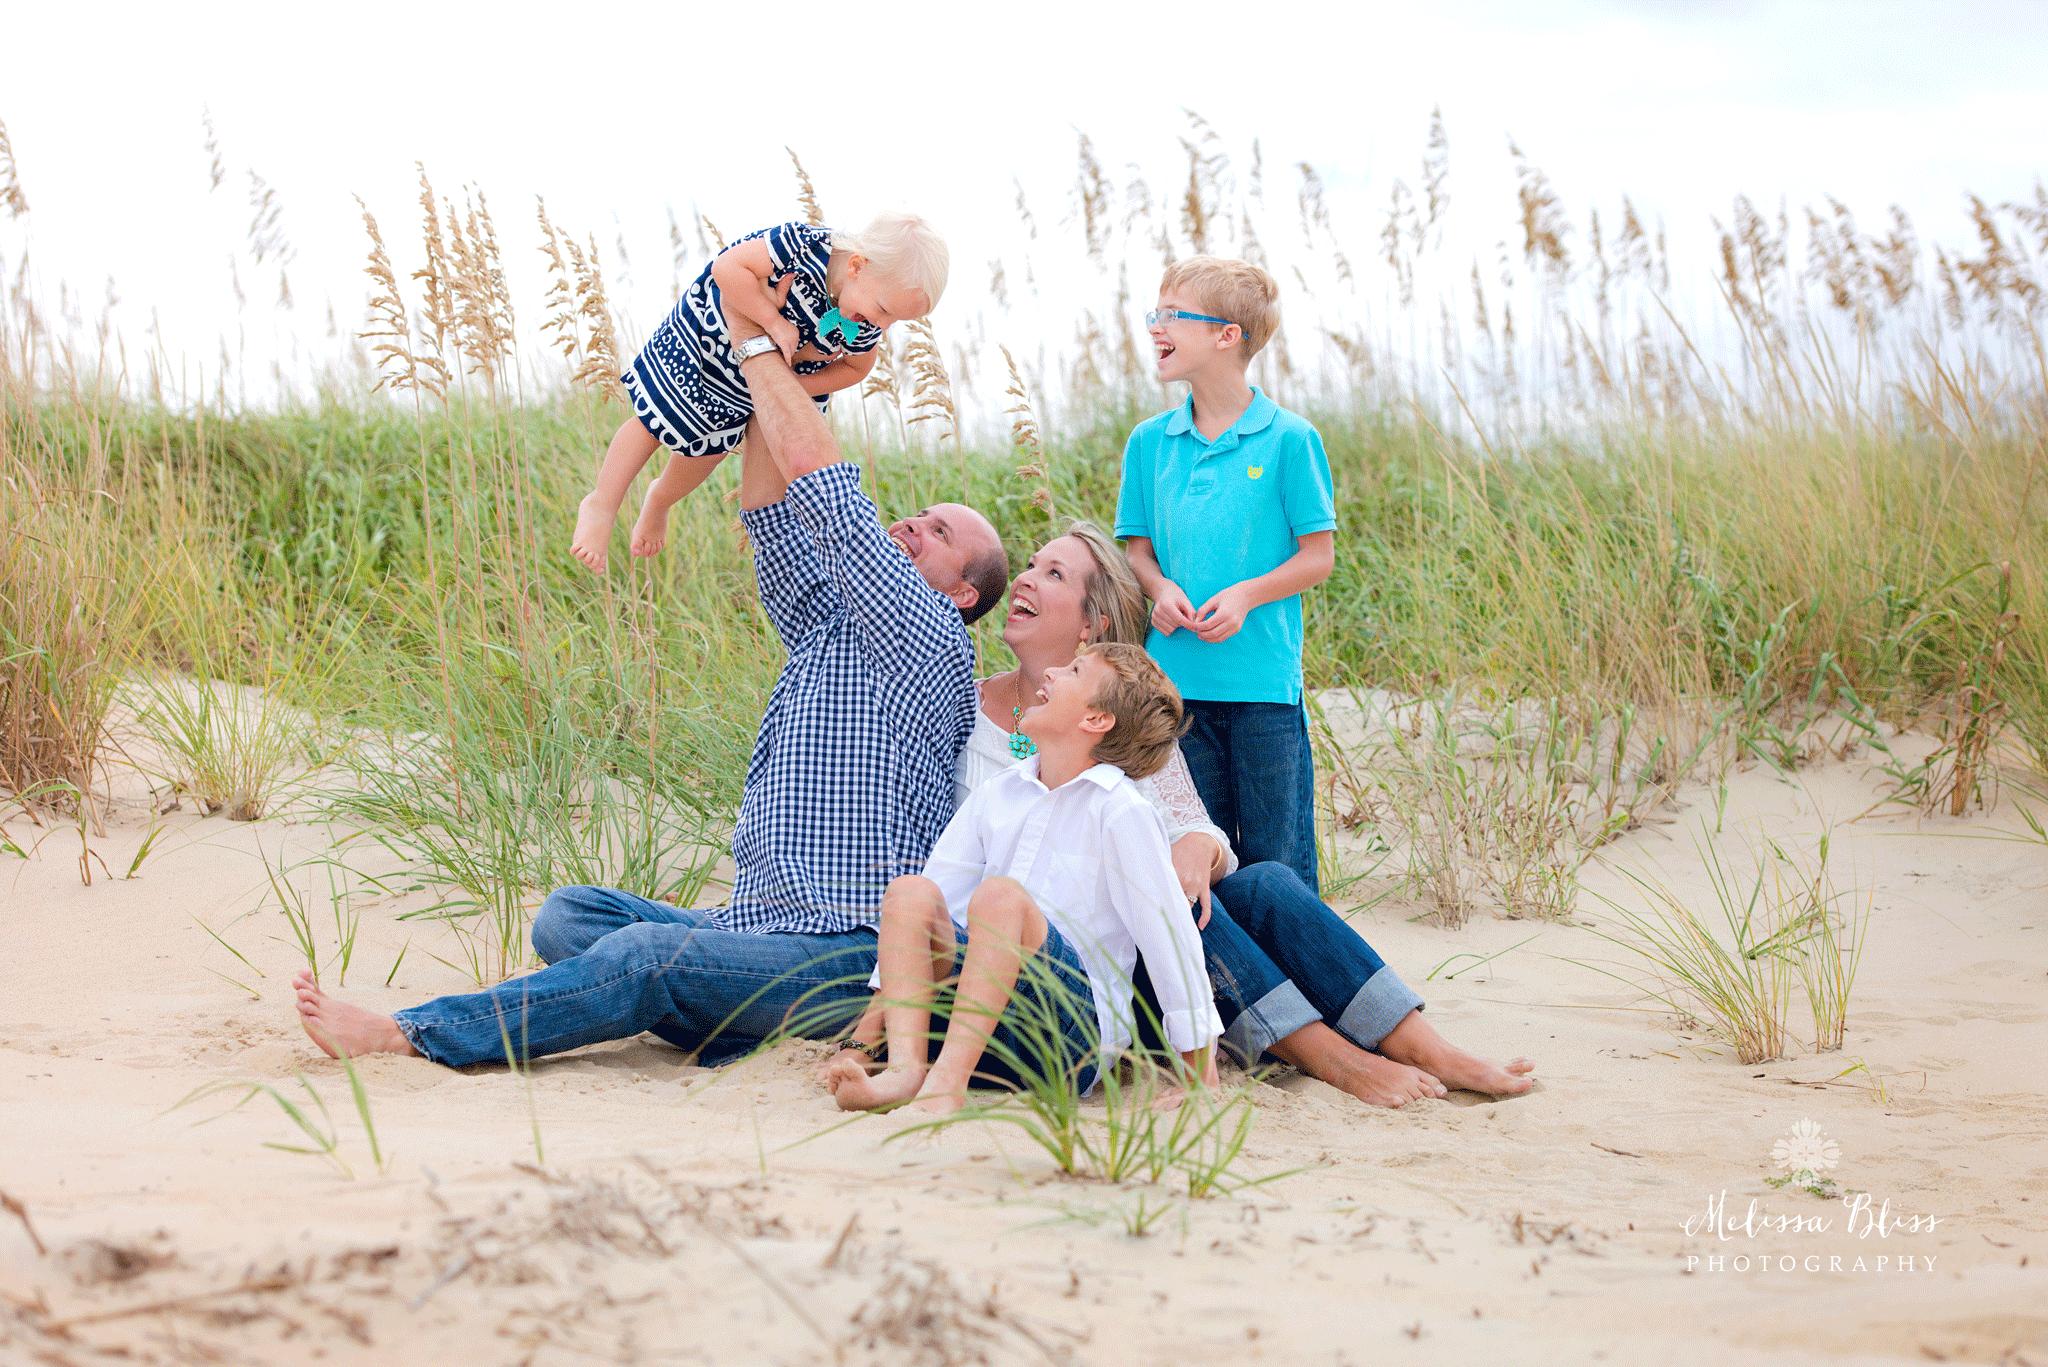 sandbridge-beach-family-photographers-virginia-beach-photographer-melissa-bliss-photography-lifestyle-photographer